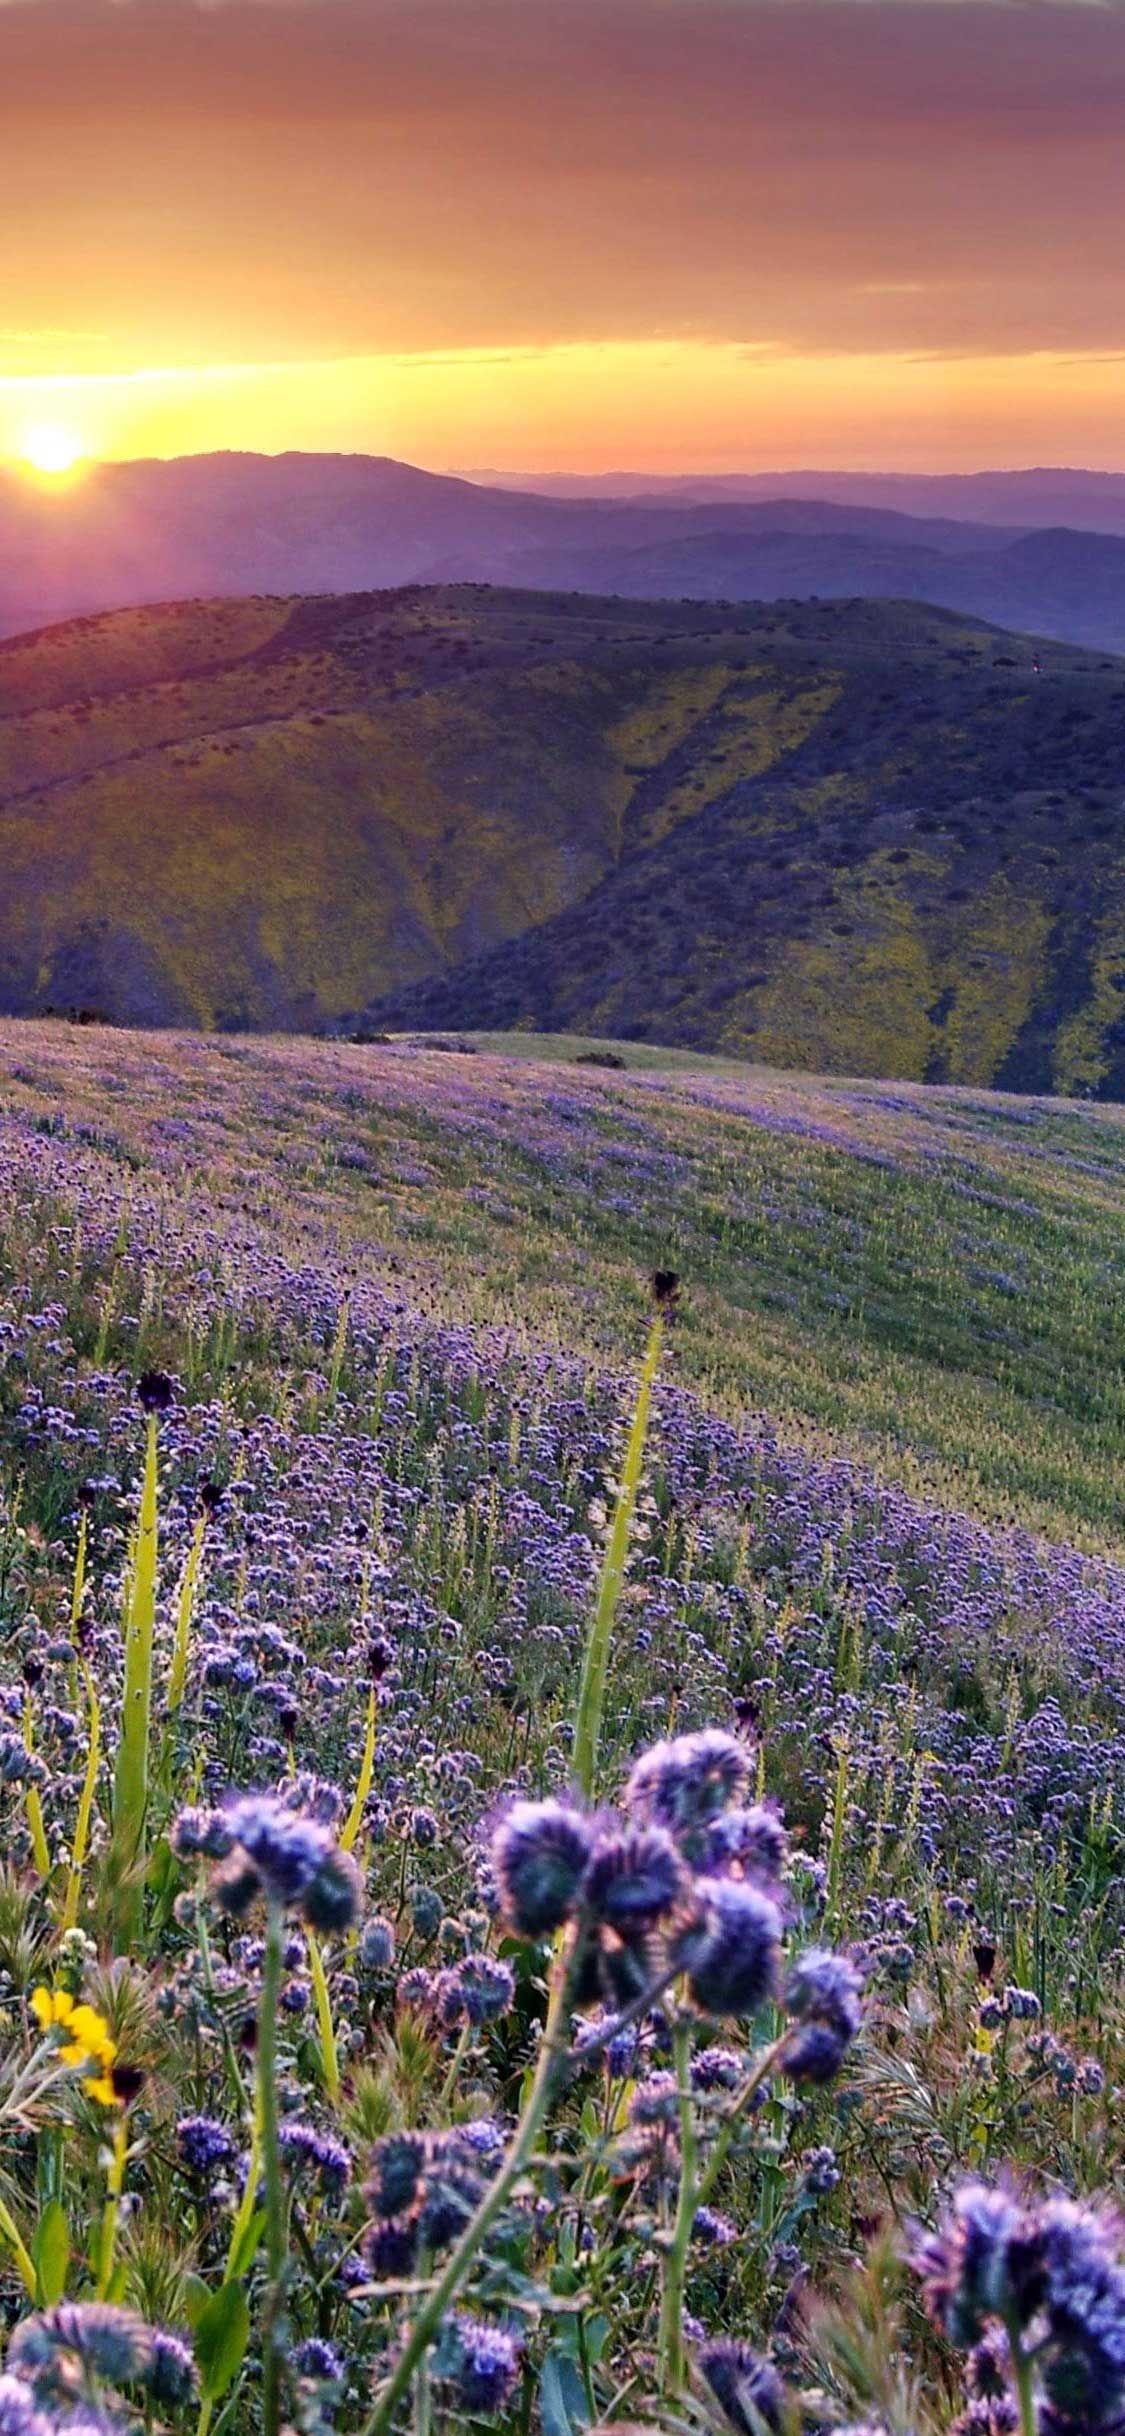 Iphone Pro Wallpaper California desert purple flower field